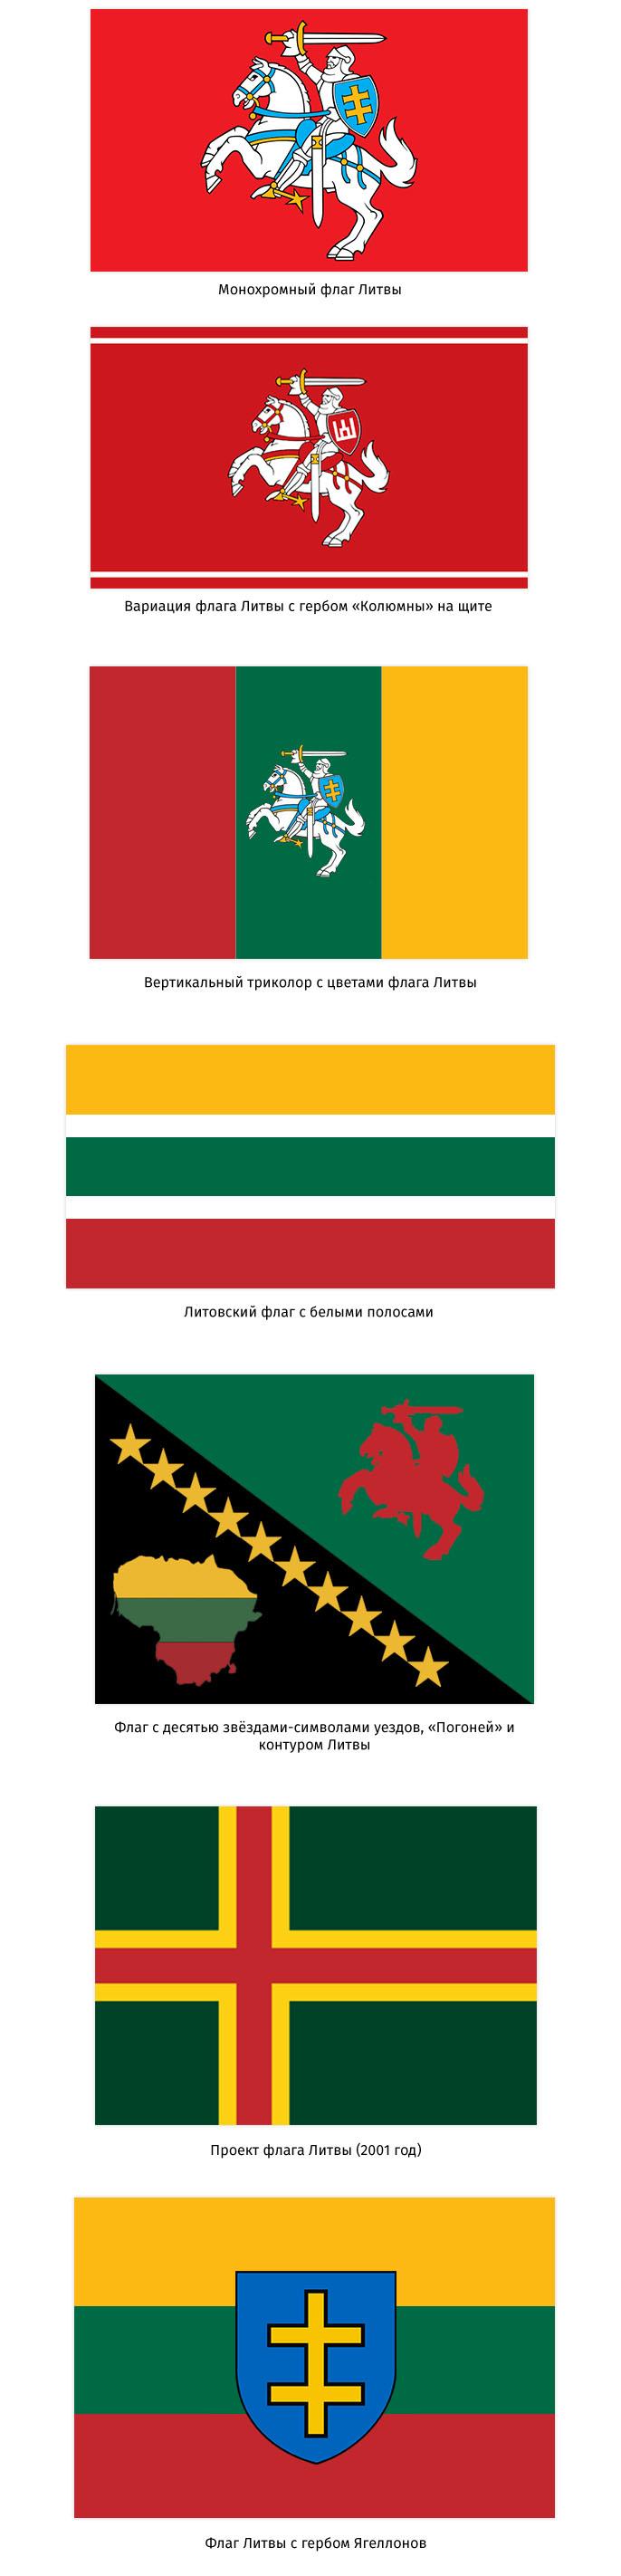 ru69-flag-leetvy-na-puti-stanovleniia-litovskoi-gosudarstvennosti_27